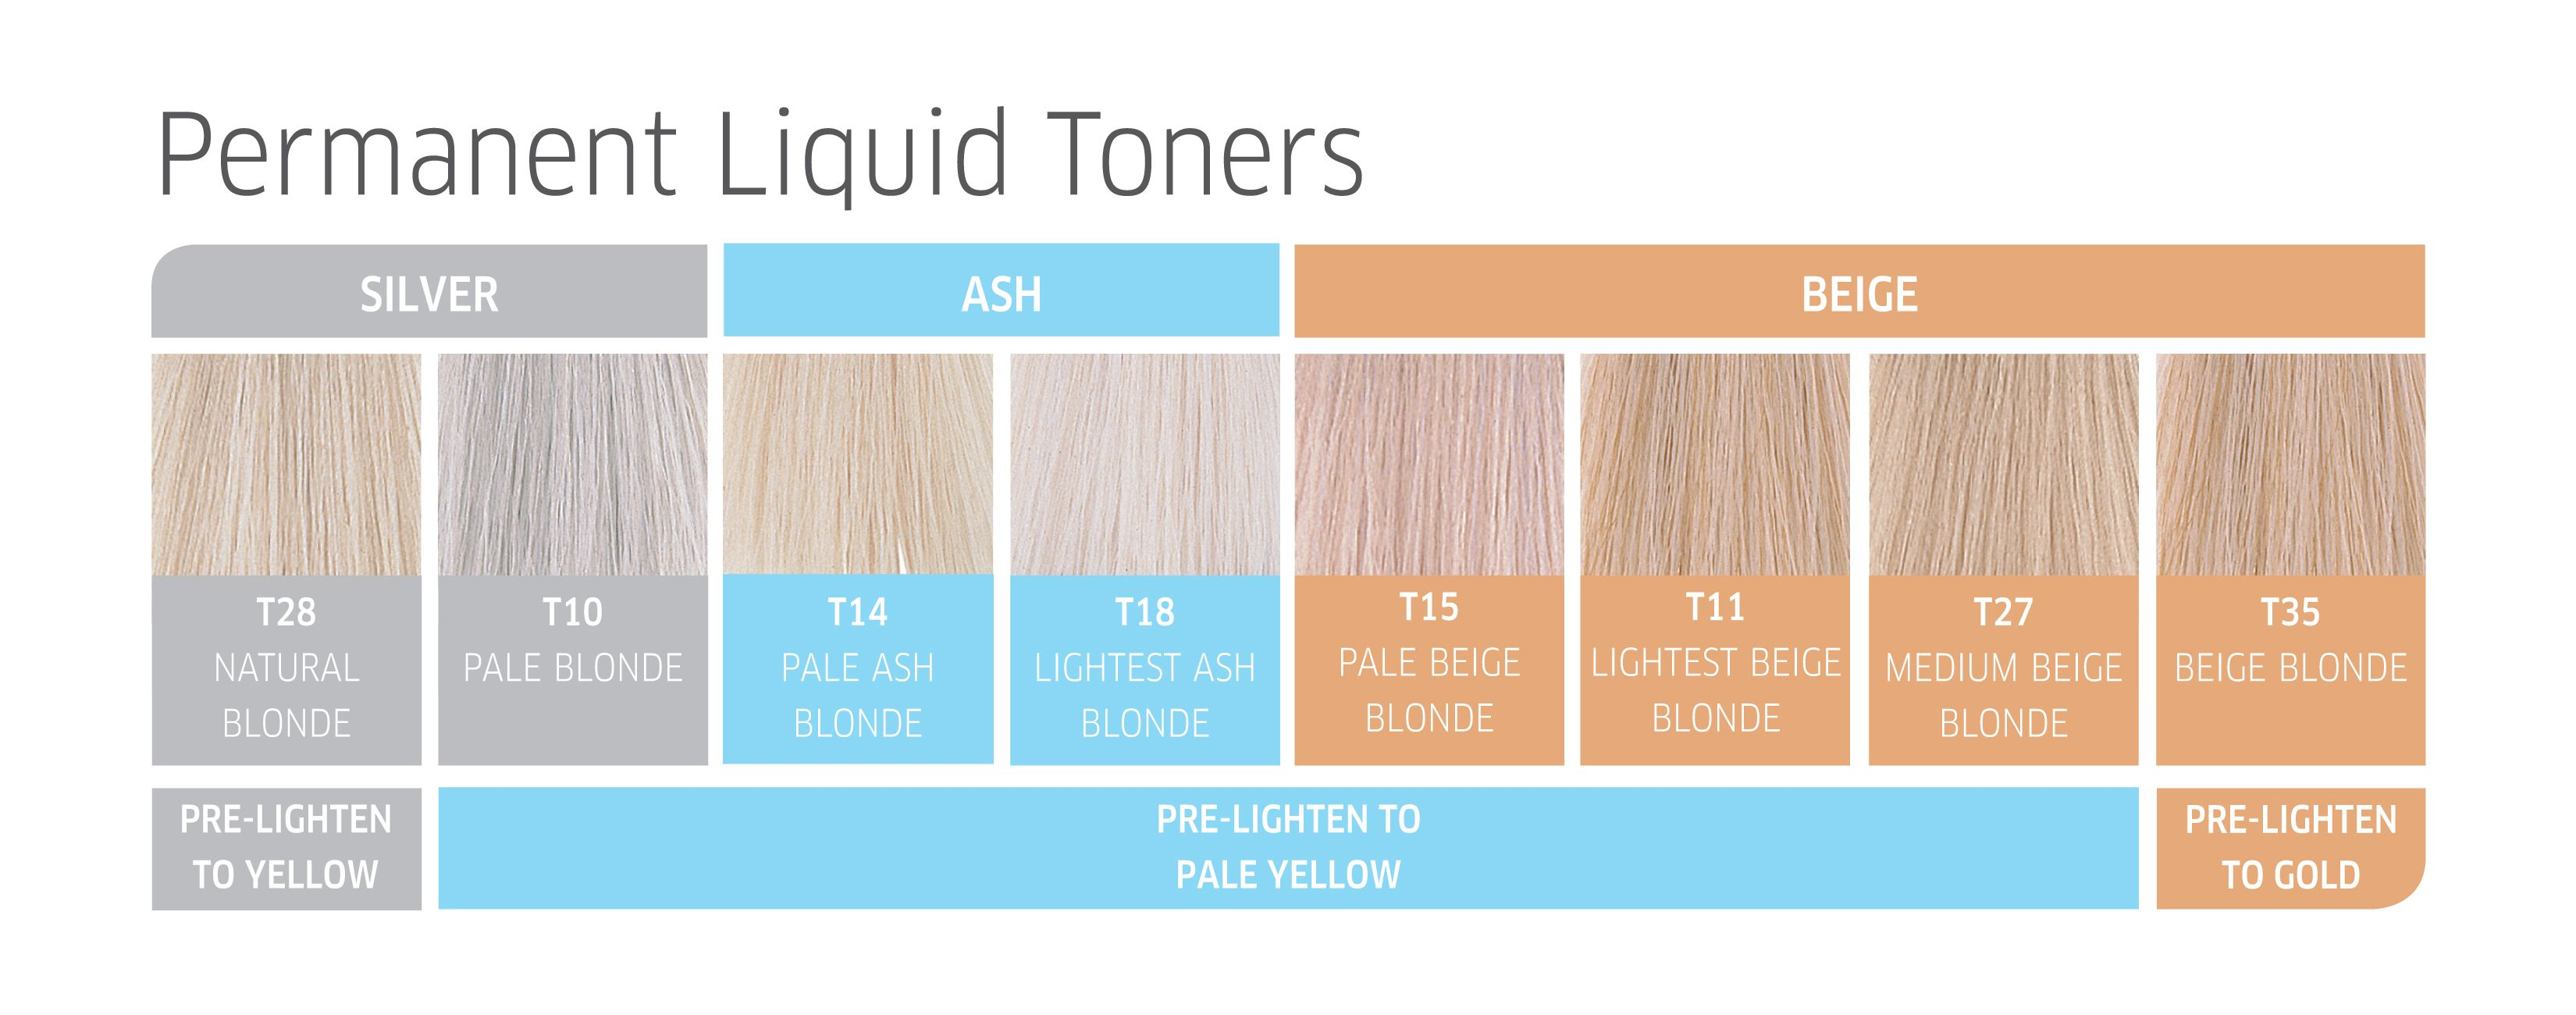 Wella permanent liquid toners lush locks pinterest hair what toner should you use for orange hair wella color charm toner chart nvjuhfo Gallery